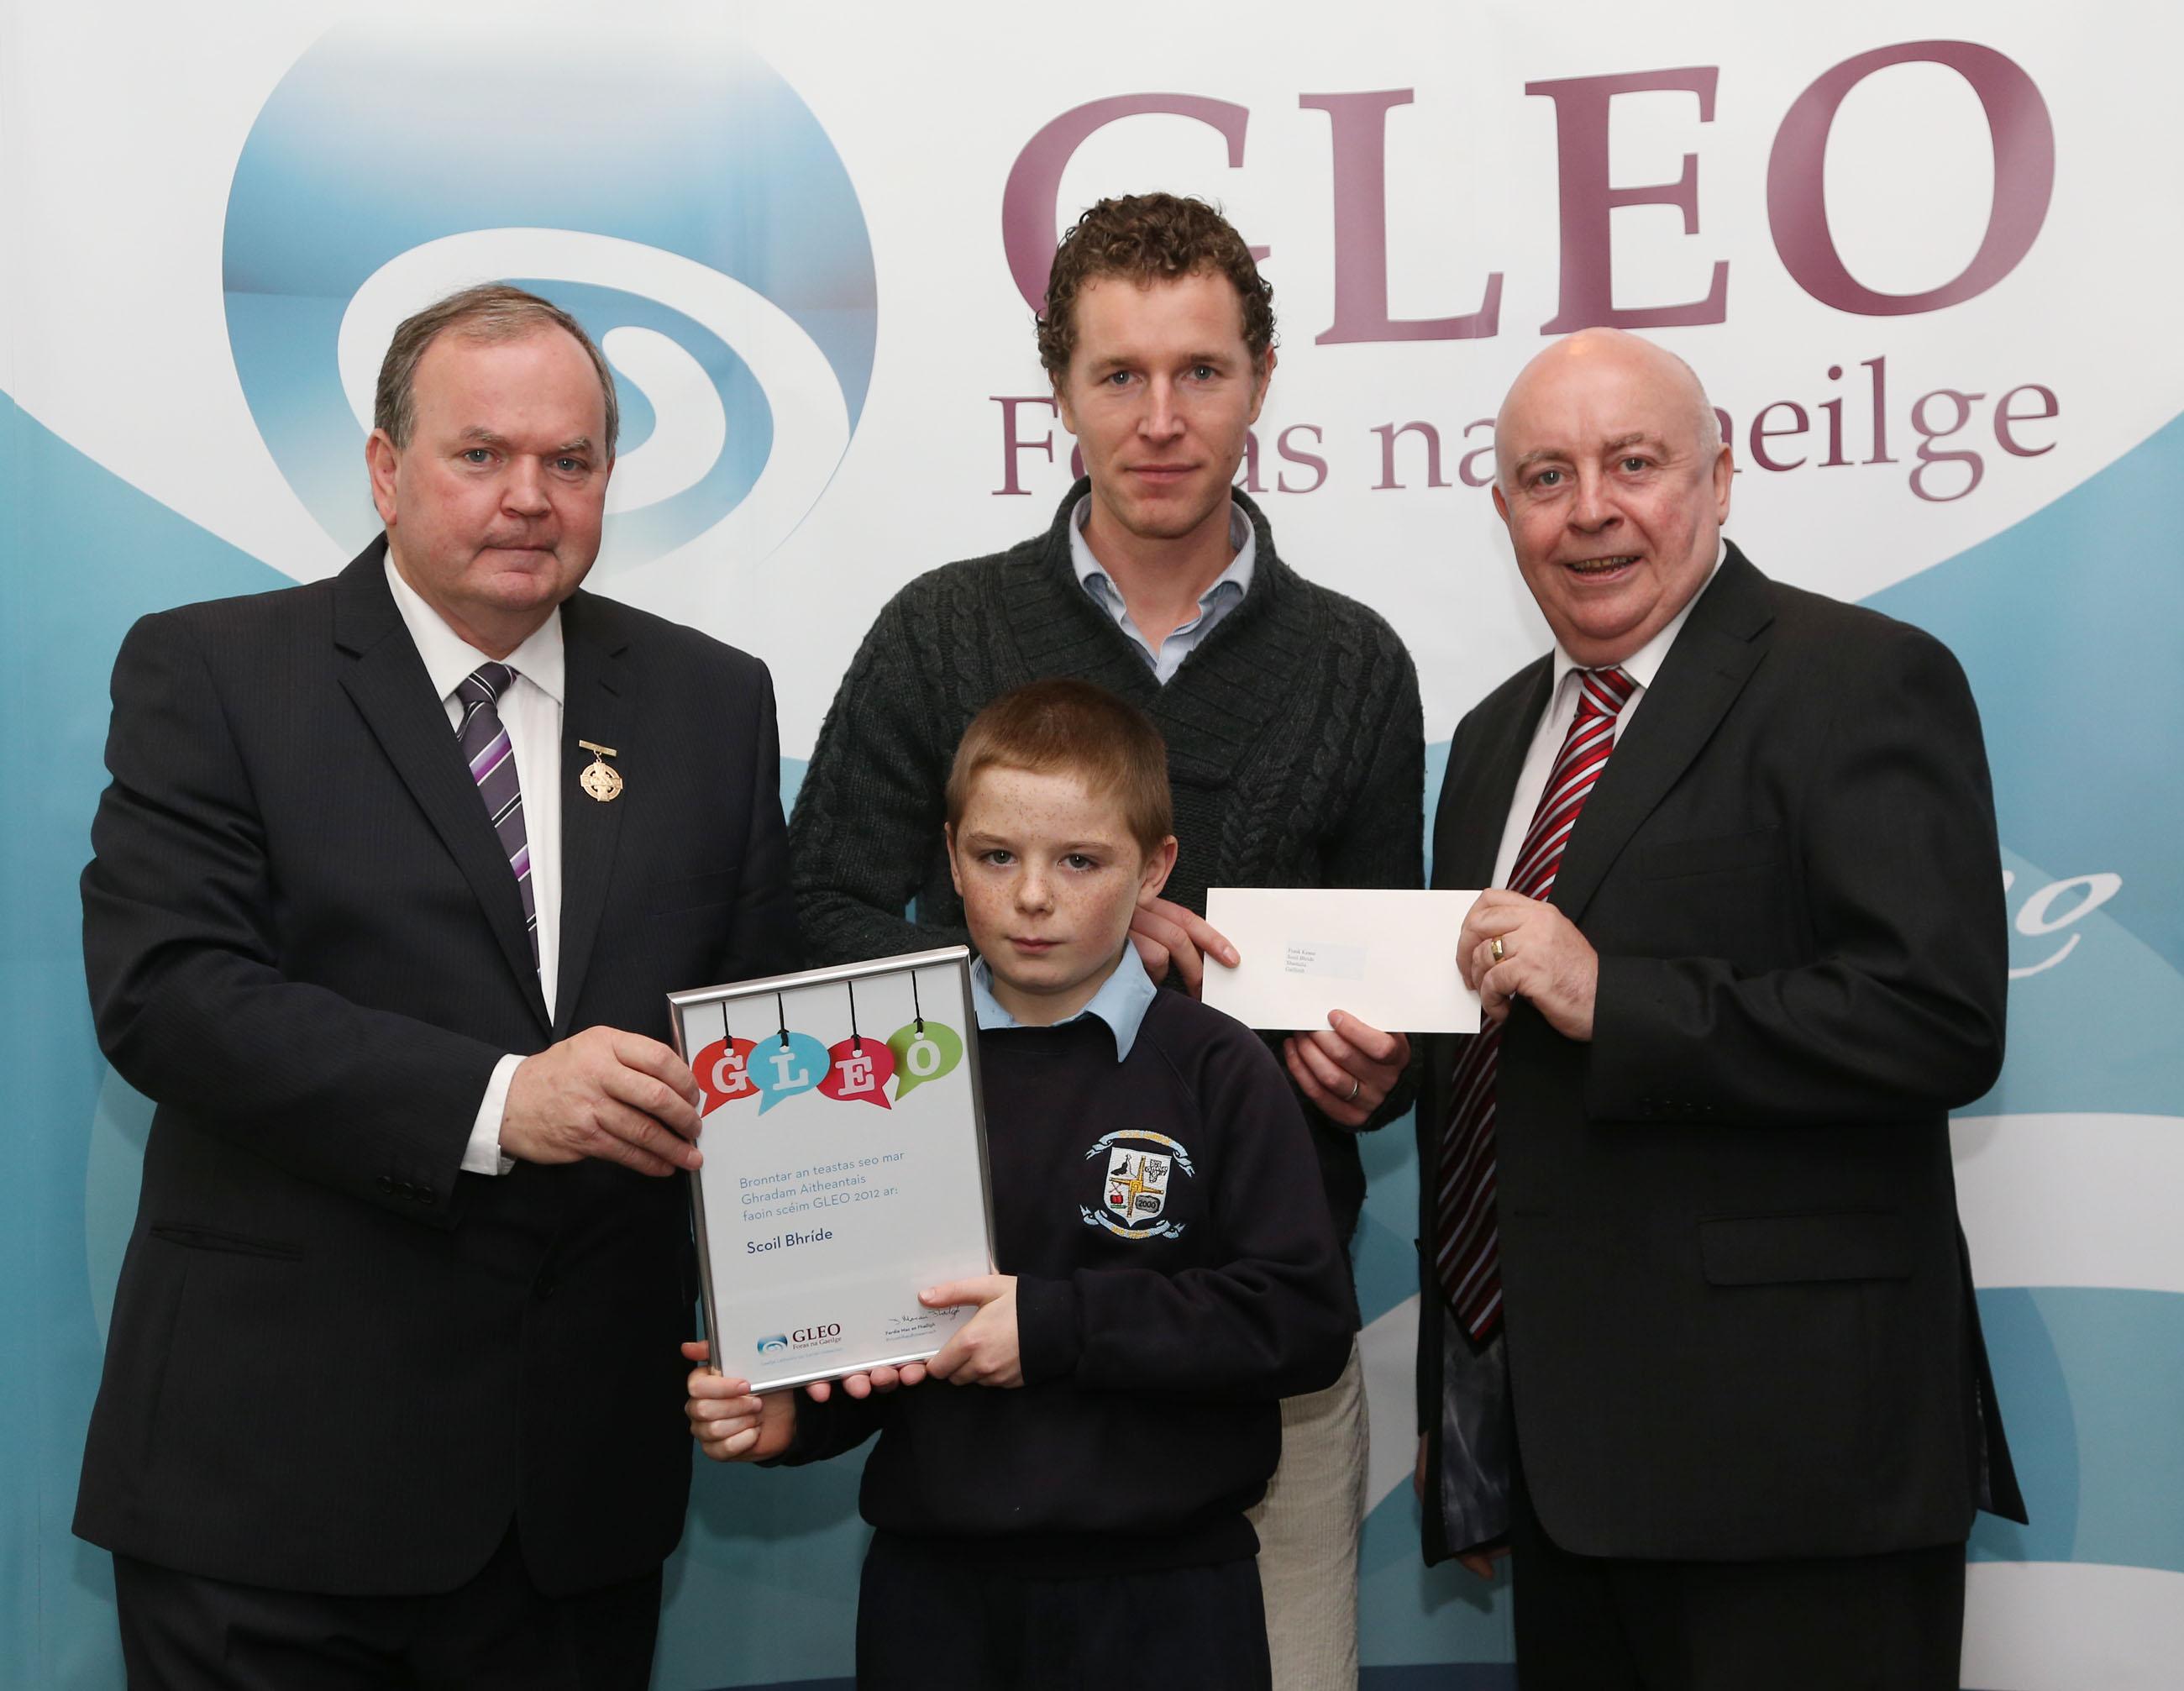 Gleo Award 2012